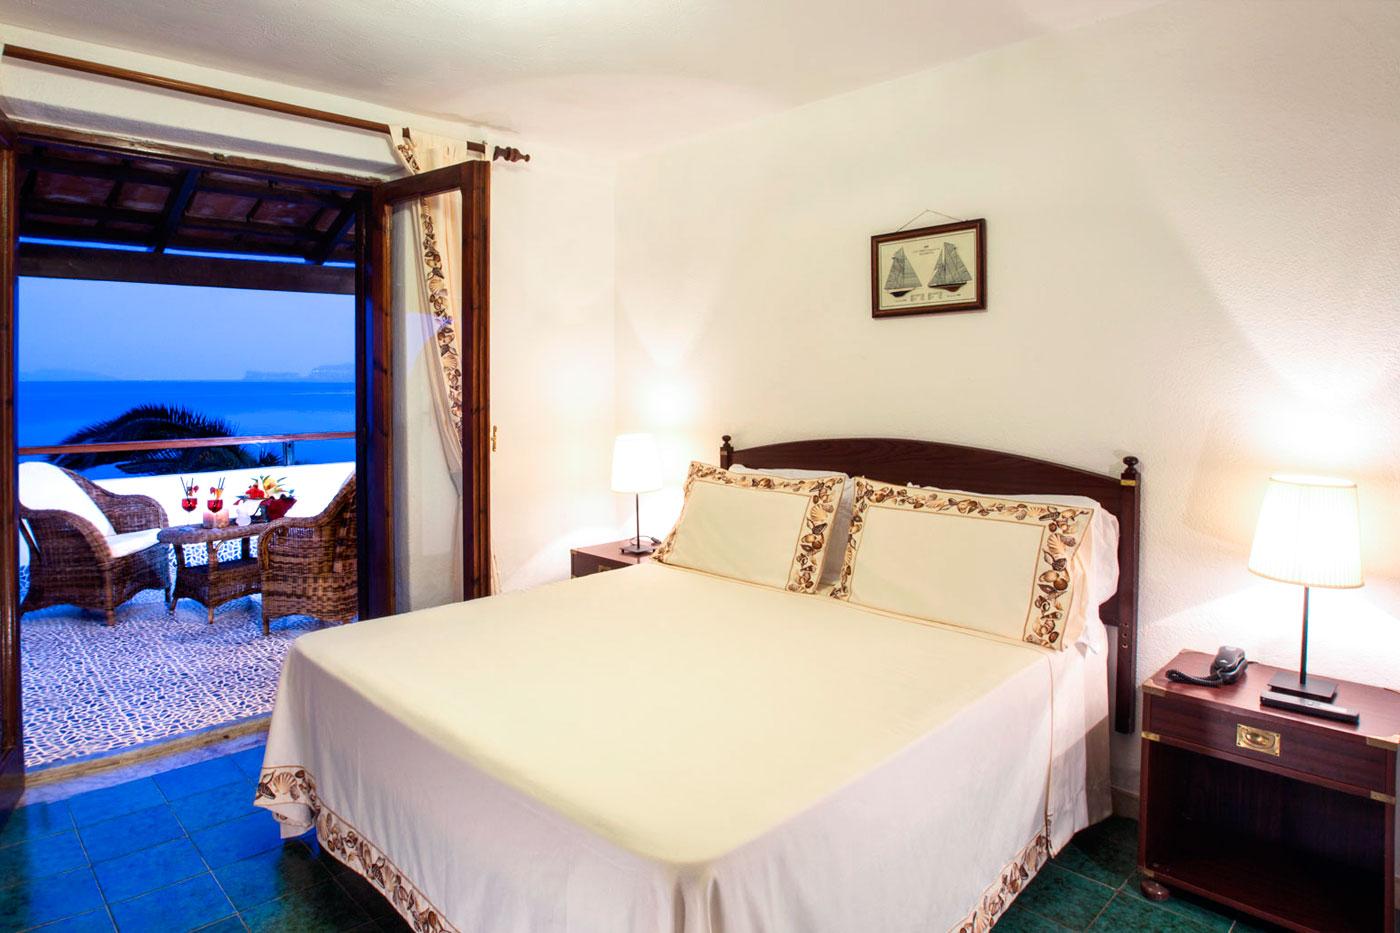 Camera Deluxe Hotel Giardino Eden Ischia